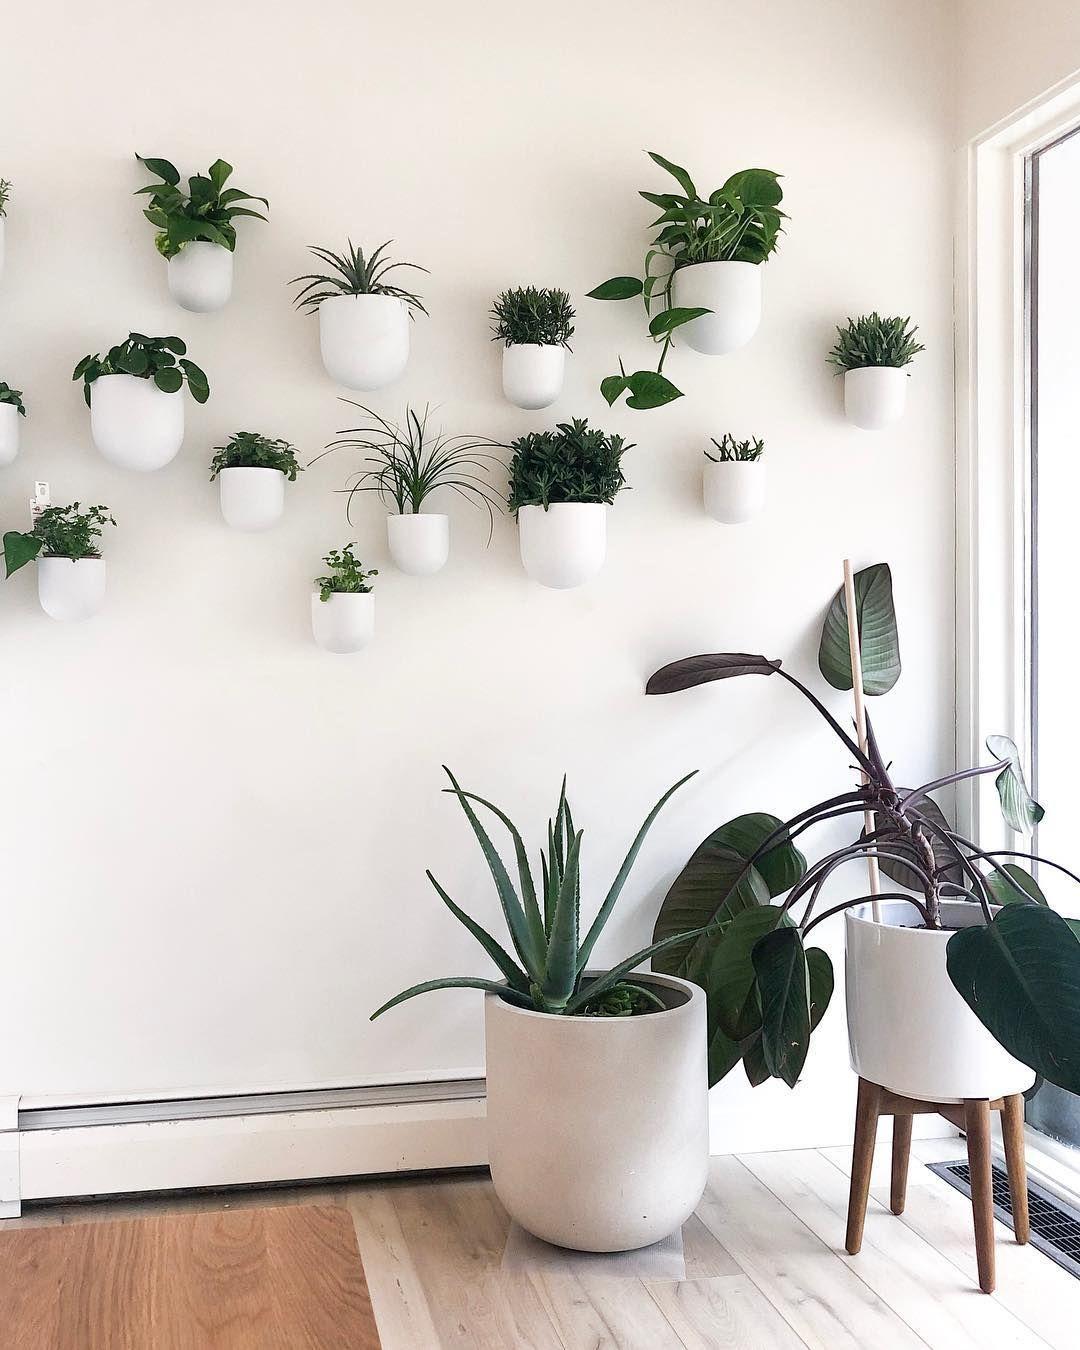 "Photo of MinnCenturyMod 丨 Claire Clemmer auf Instagram: ""Plant Wand g"